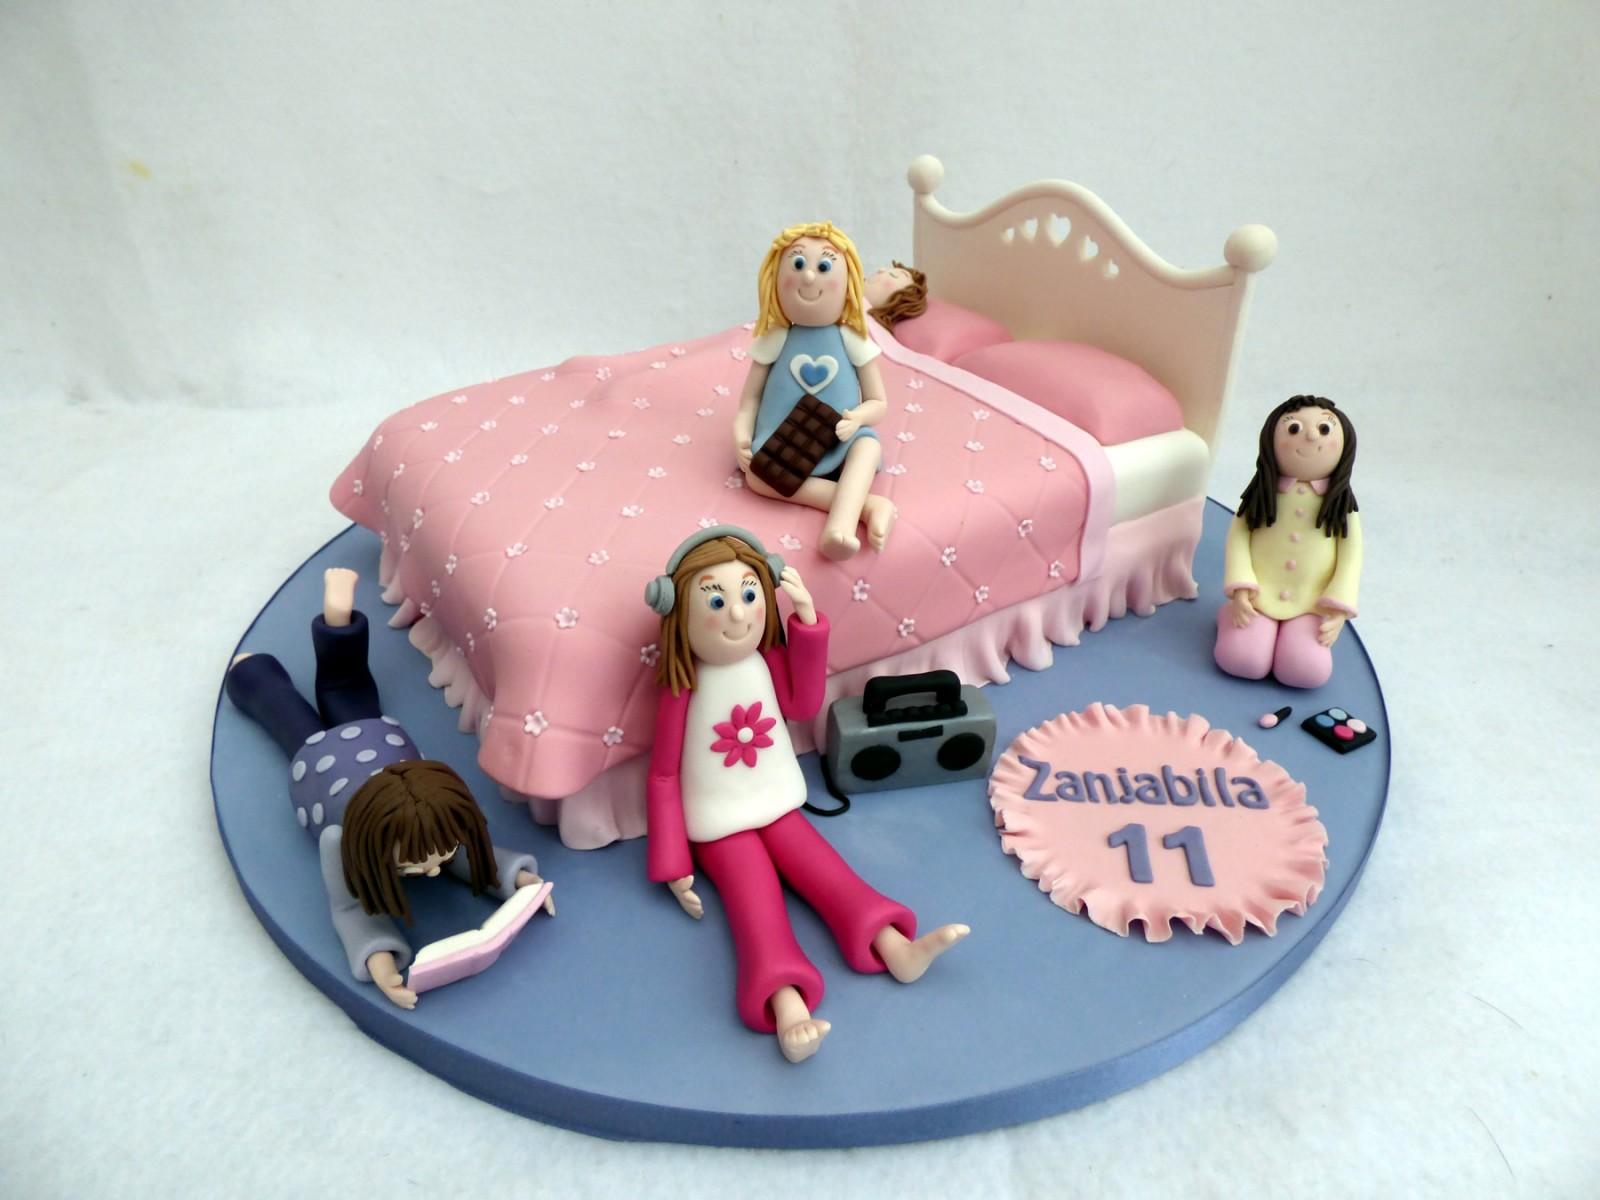 Remarkable Girls Sleepover Novelty Birthday Cake Susies Cakes Funny Birthday Cards Online Inifodamsfinfo